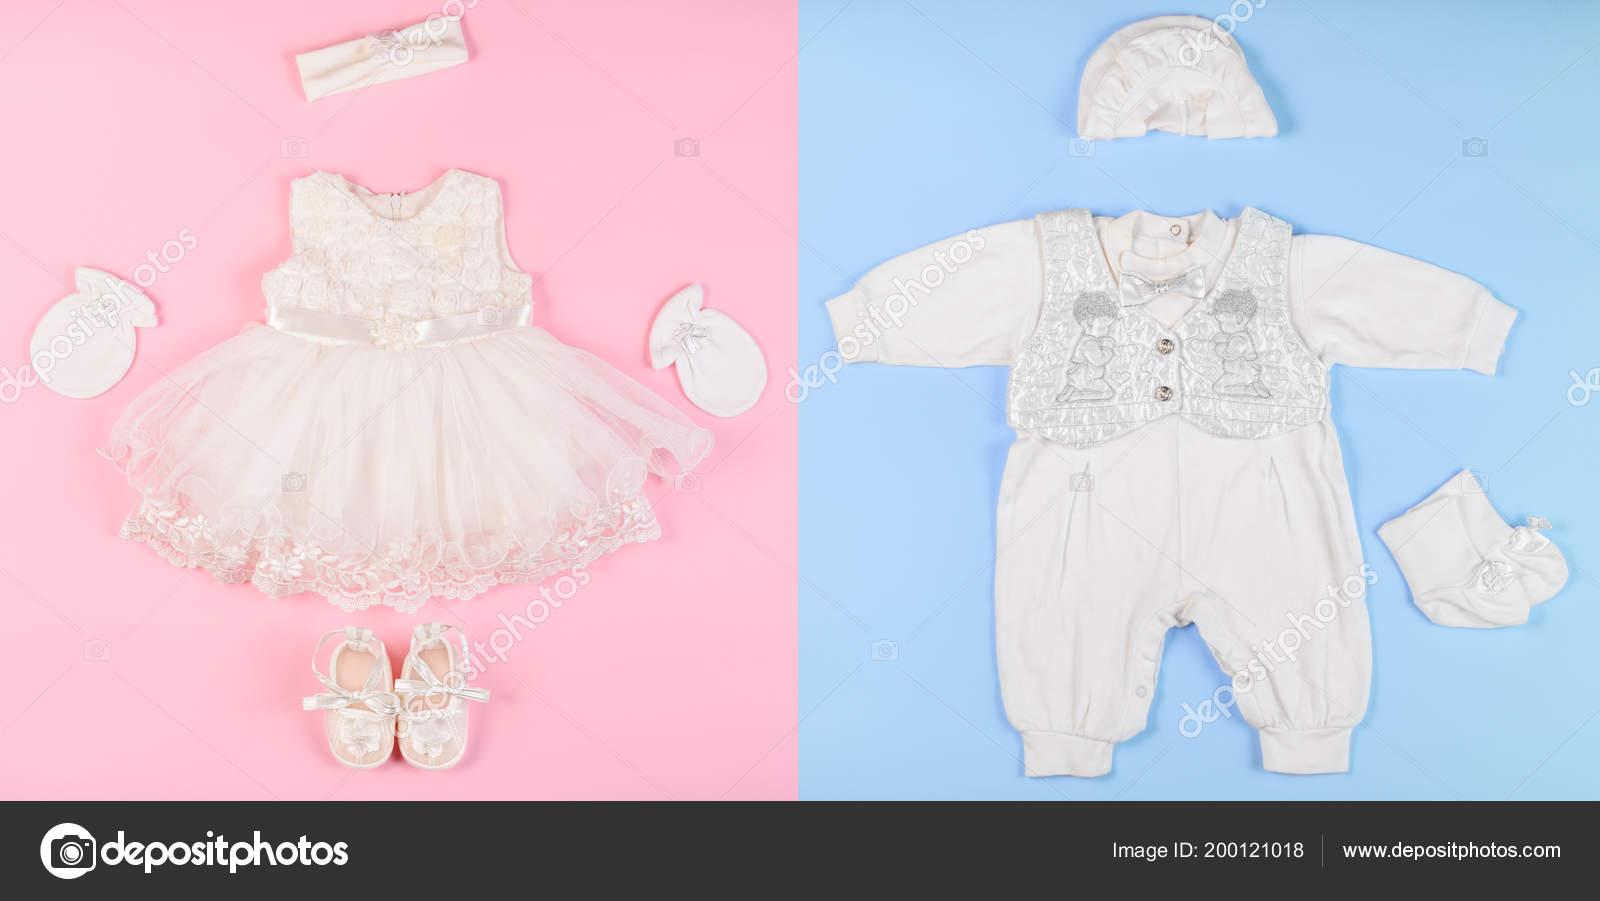 09c5a058c2f Μια Όμορφη Συνολικά Για Ένα Νεογέννητο Αγόρι Και Φόρεμα Για — Φωτογραφία  Αρχείου